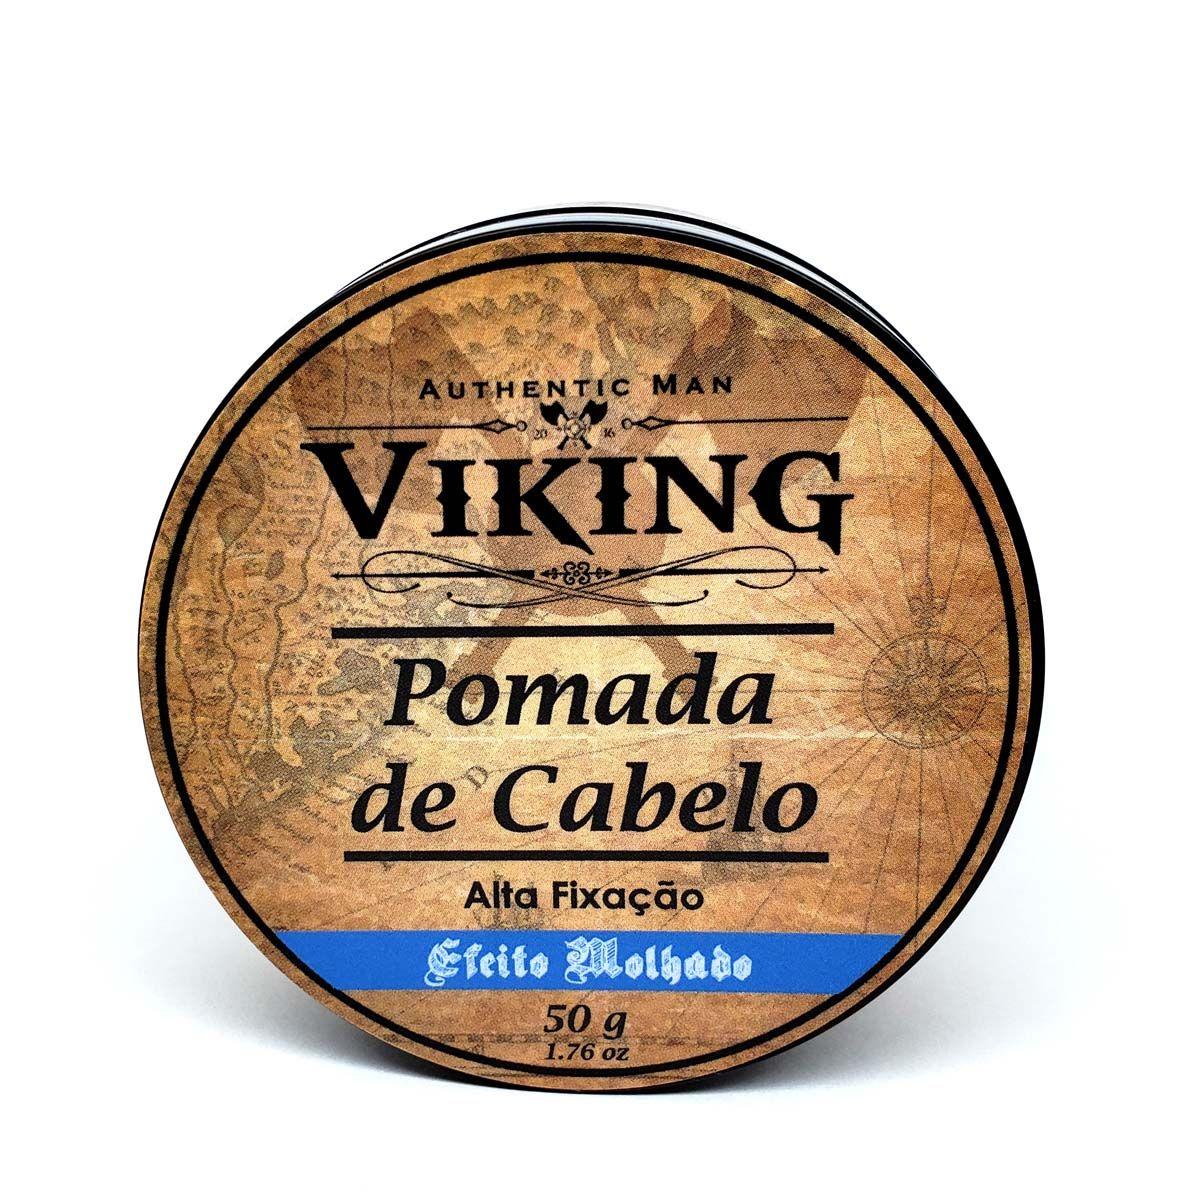 Pomada de Cabelo - Efeito Molhado - Viking  - Viking